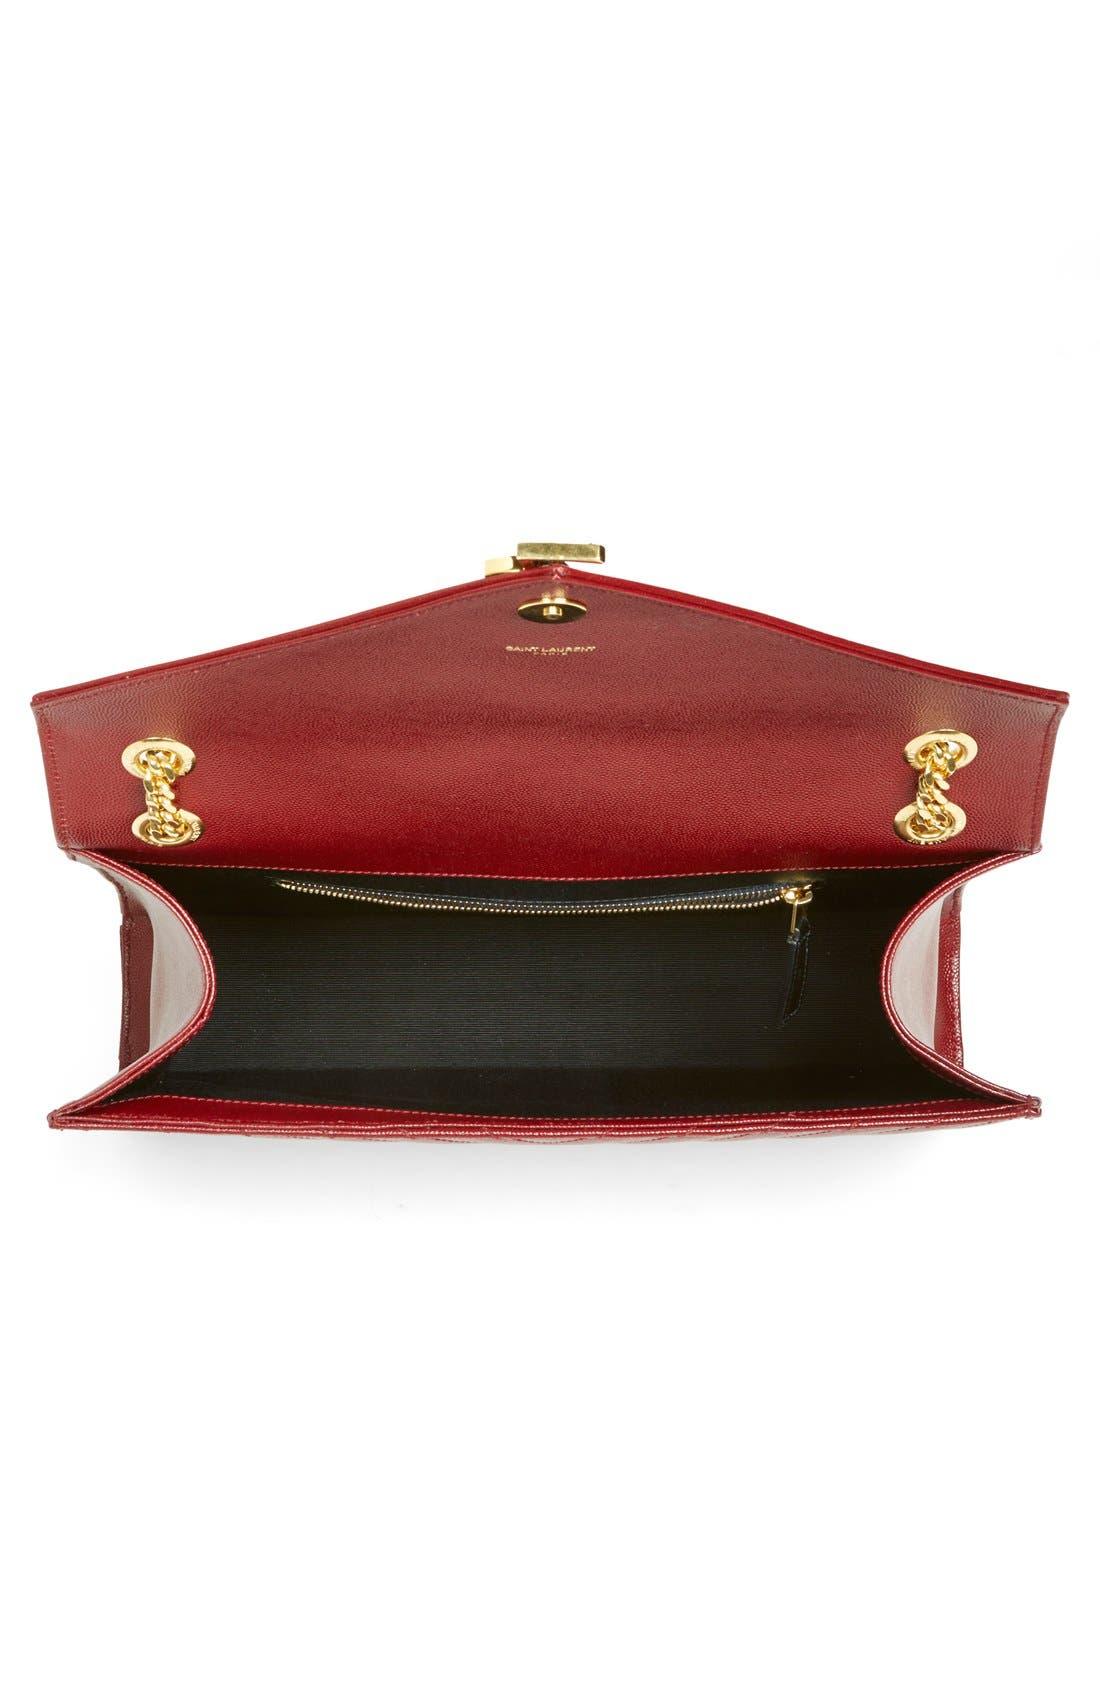 ,                             'Large Monogram' Grained Leather Shoulder Bag,                             Alternate thumbnail 54, color,                             930